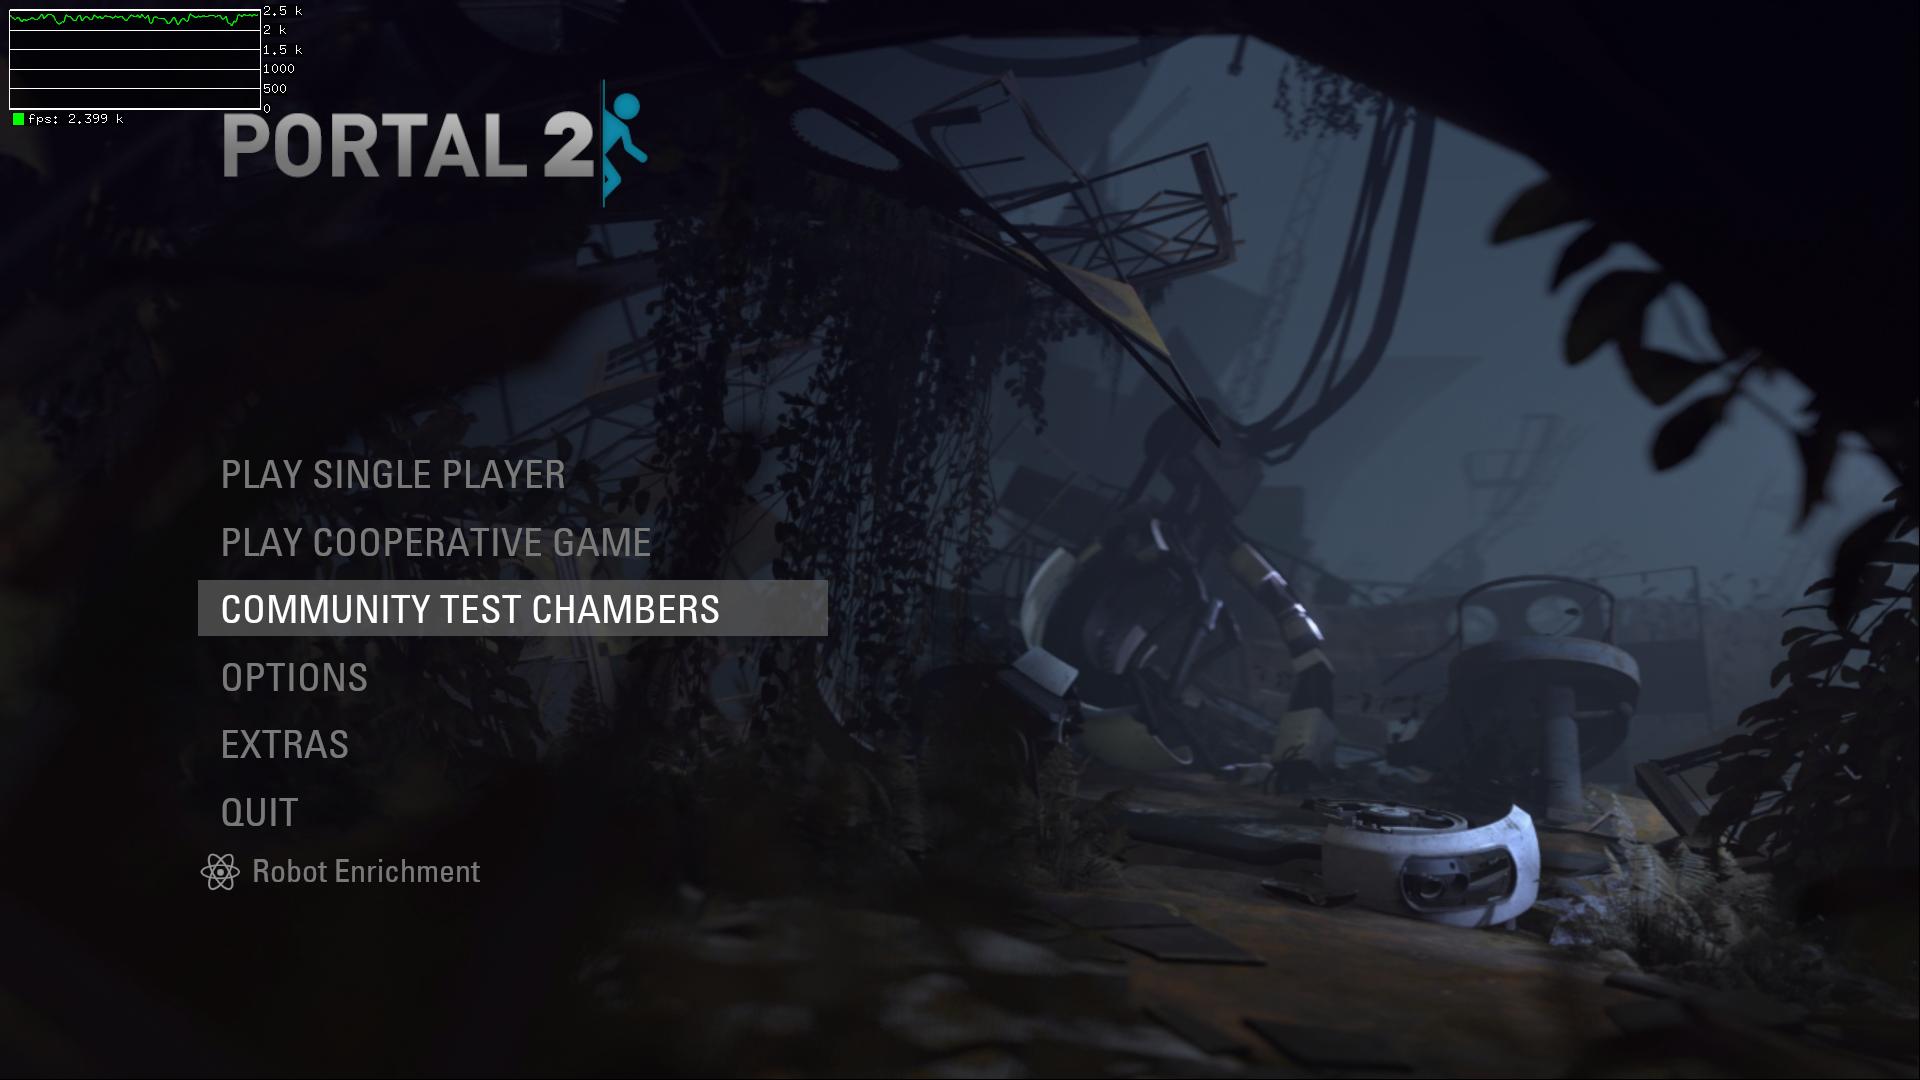 portal2-title.png